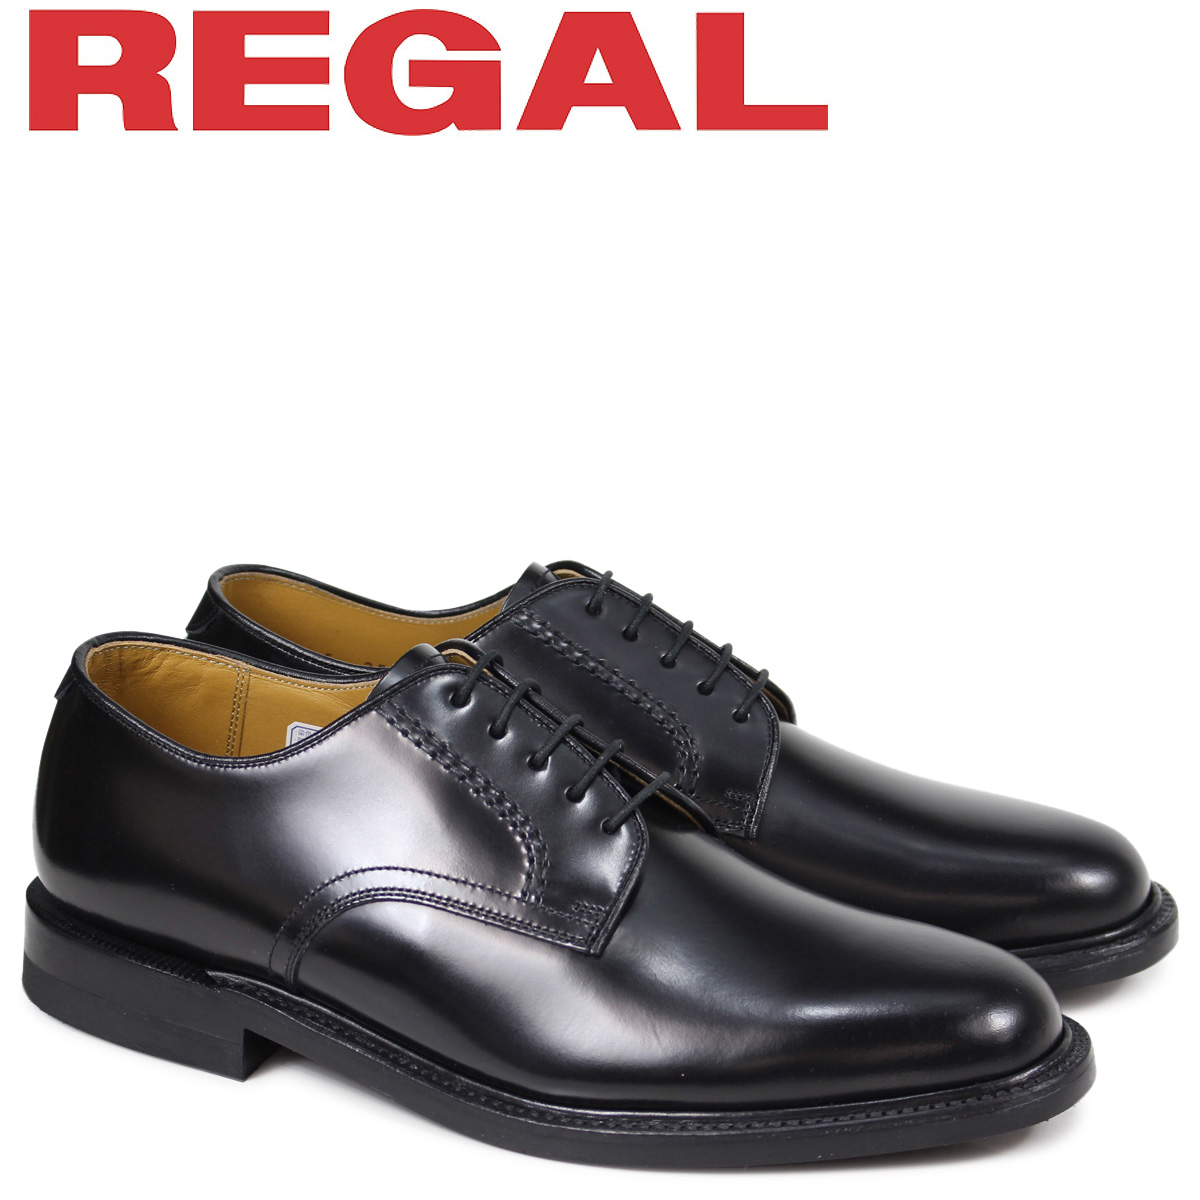 SneaK Global Online Shop | Rakuten Global SneaK Market: Black 2504NA [3/23 Shinnyu load] made in Regal shoes men REGAL plane toe business shoes Japan c5c6e2